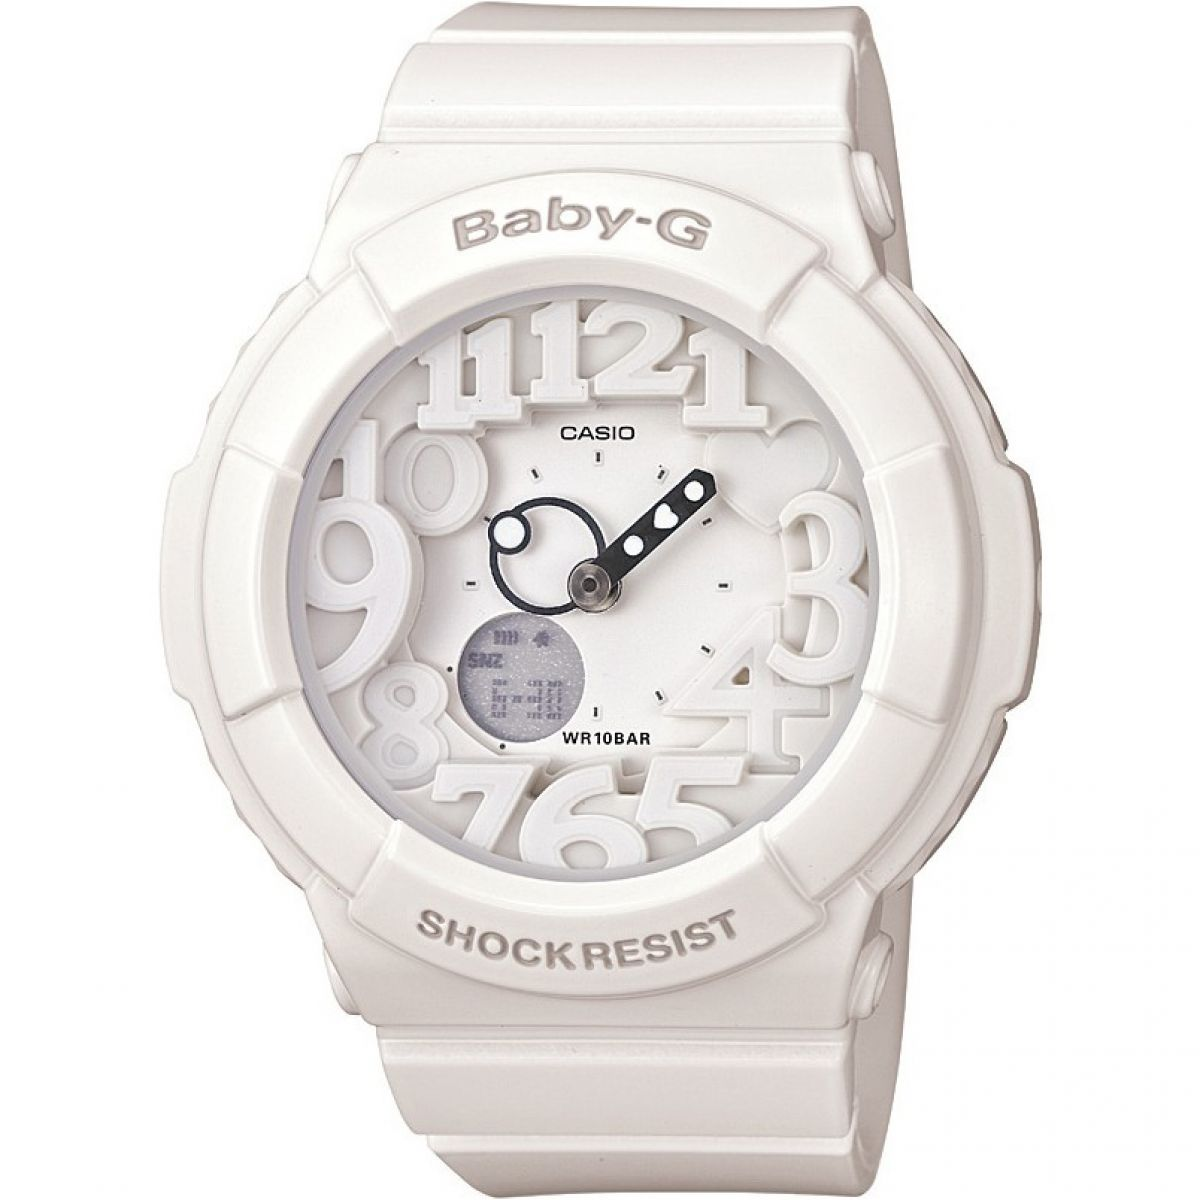 ladies casio baby g alarm chronograph watch bga 131 7ber rh watchshop com casio baby g bg-169a instruction manual casio baby g bg-191 instruction manual